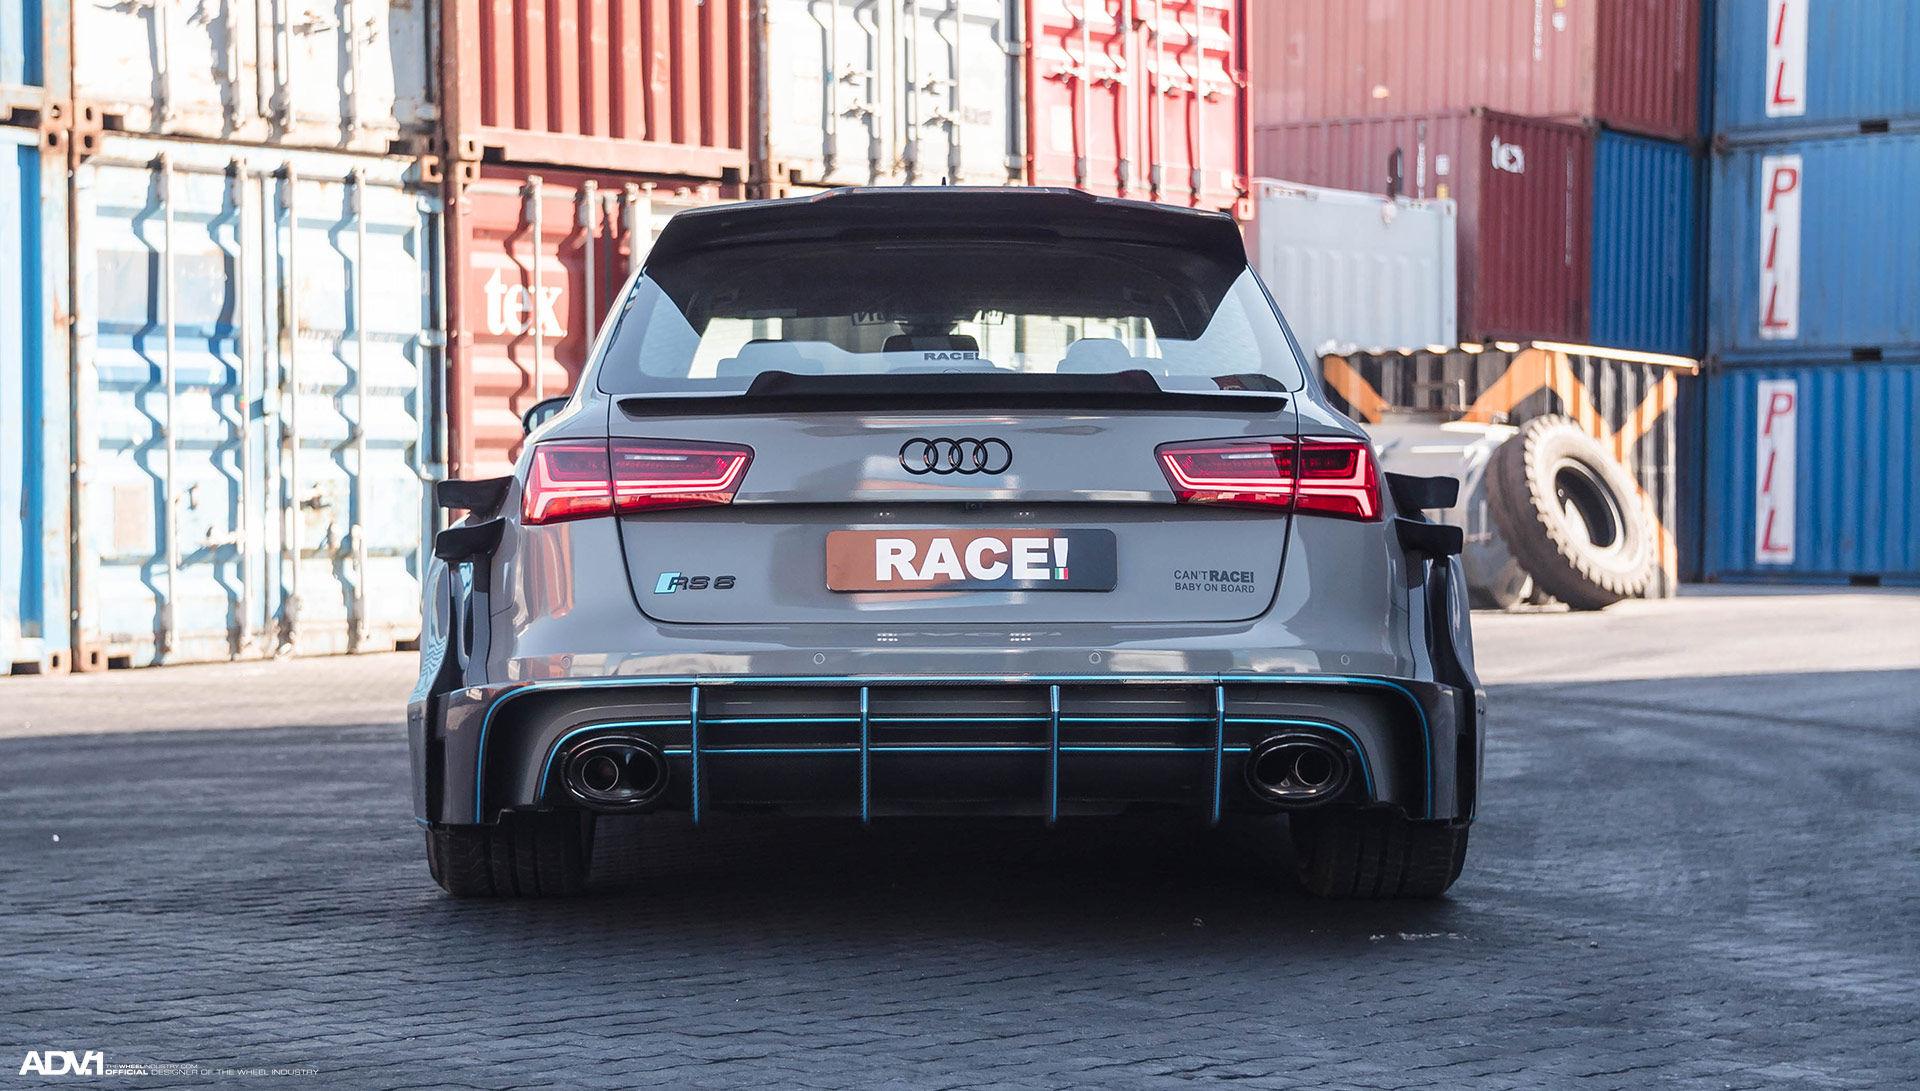 Audi RS 6 | Nardo Gray Carbon Fiber Widebody Audi RS6 Avant - ADV.1 Wheels ADV7R Track Spec CS